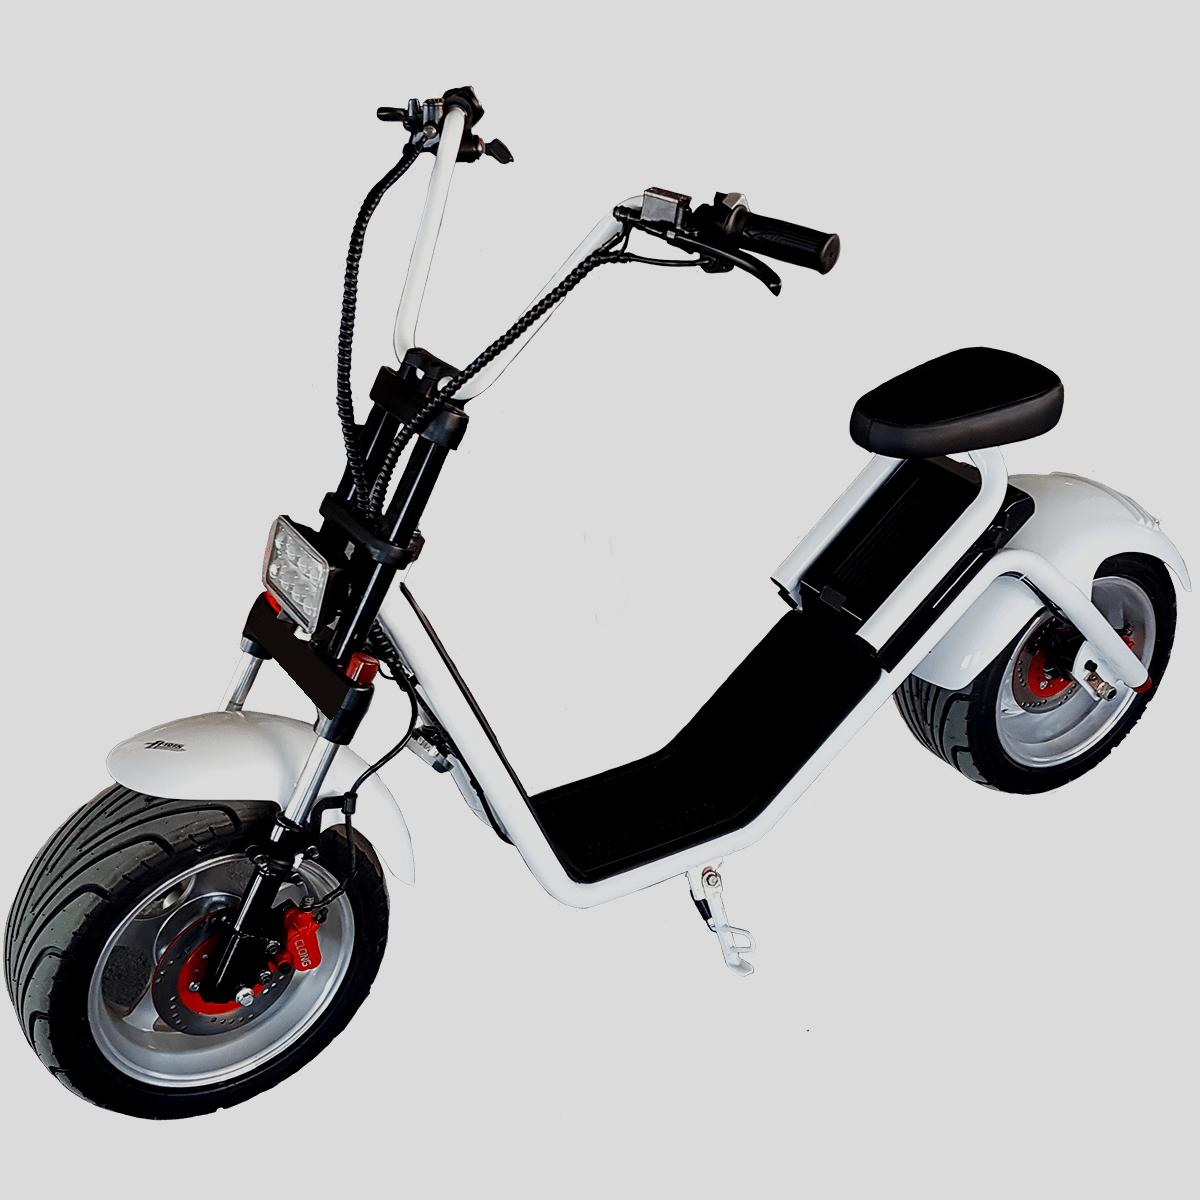 elektro scooter mit strassenzulassung. Black Bedroom Furniture Sets. Home Design Ideas